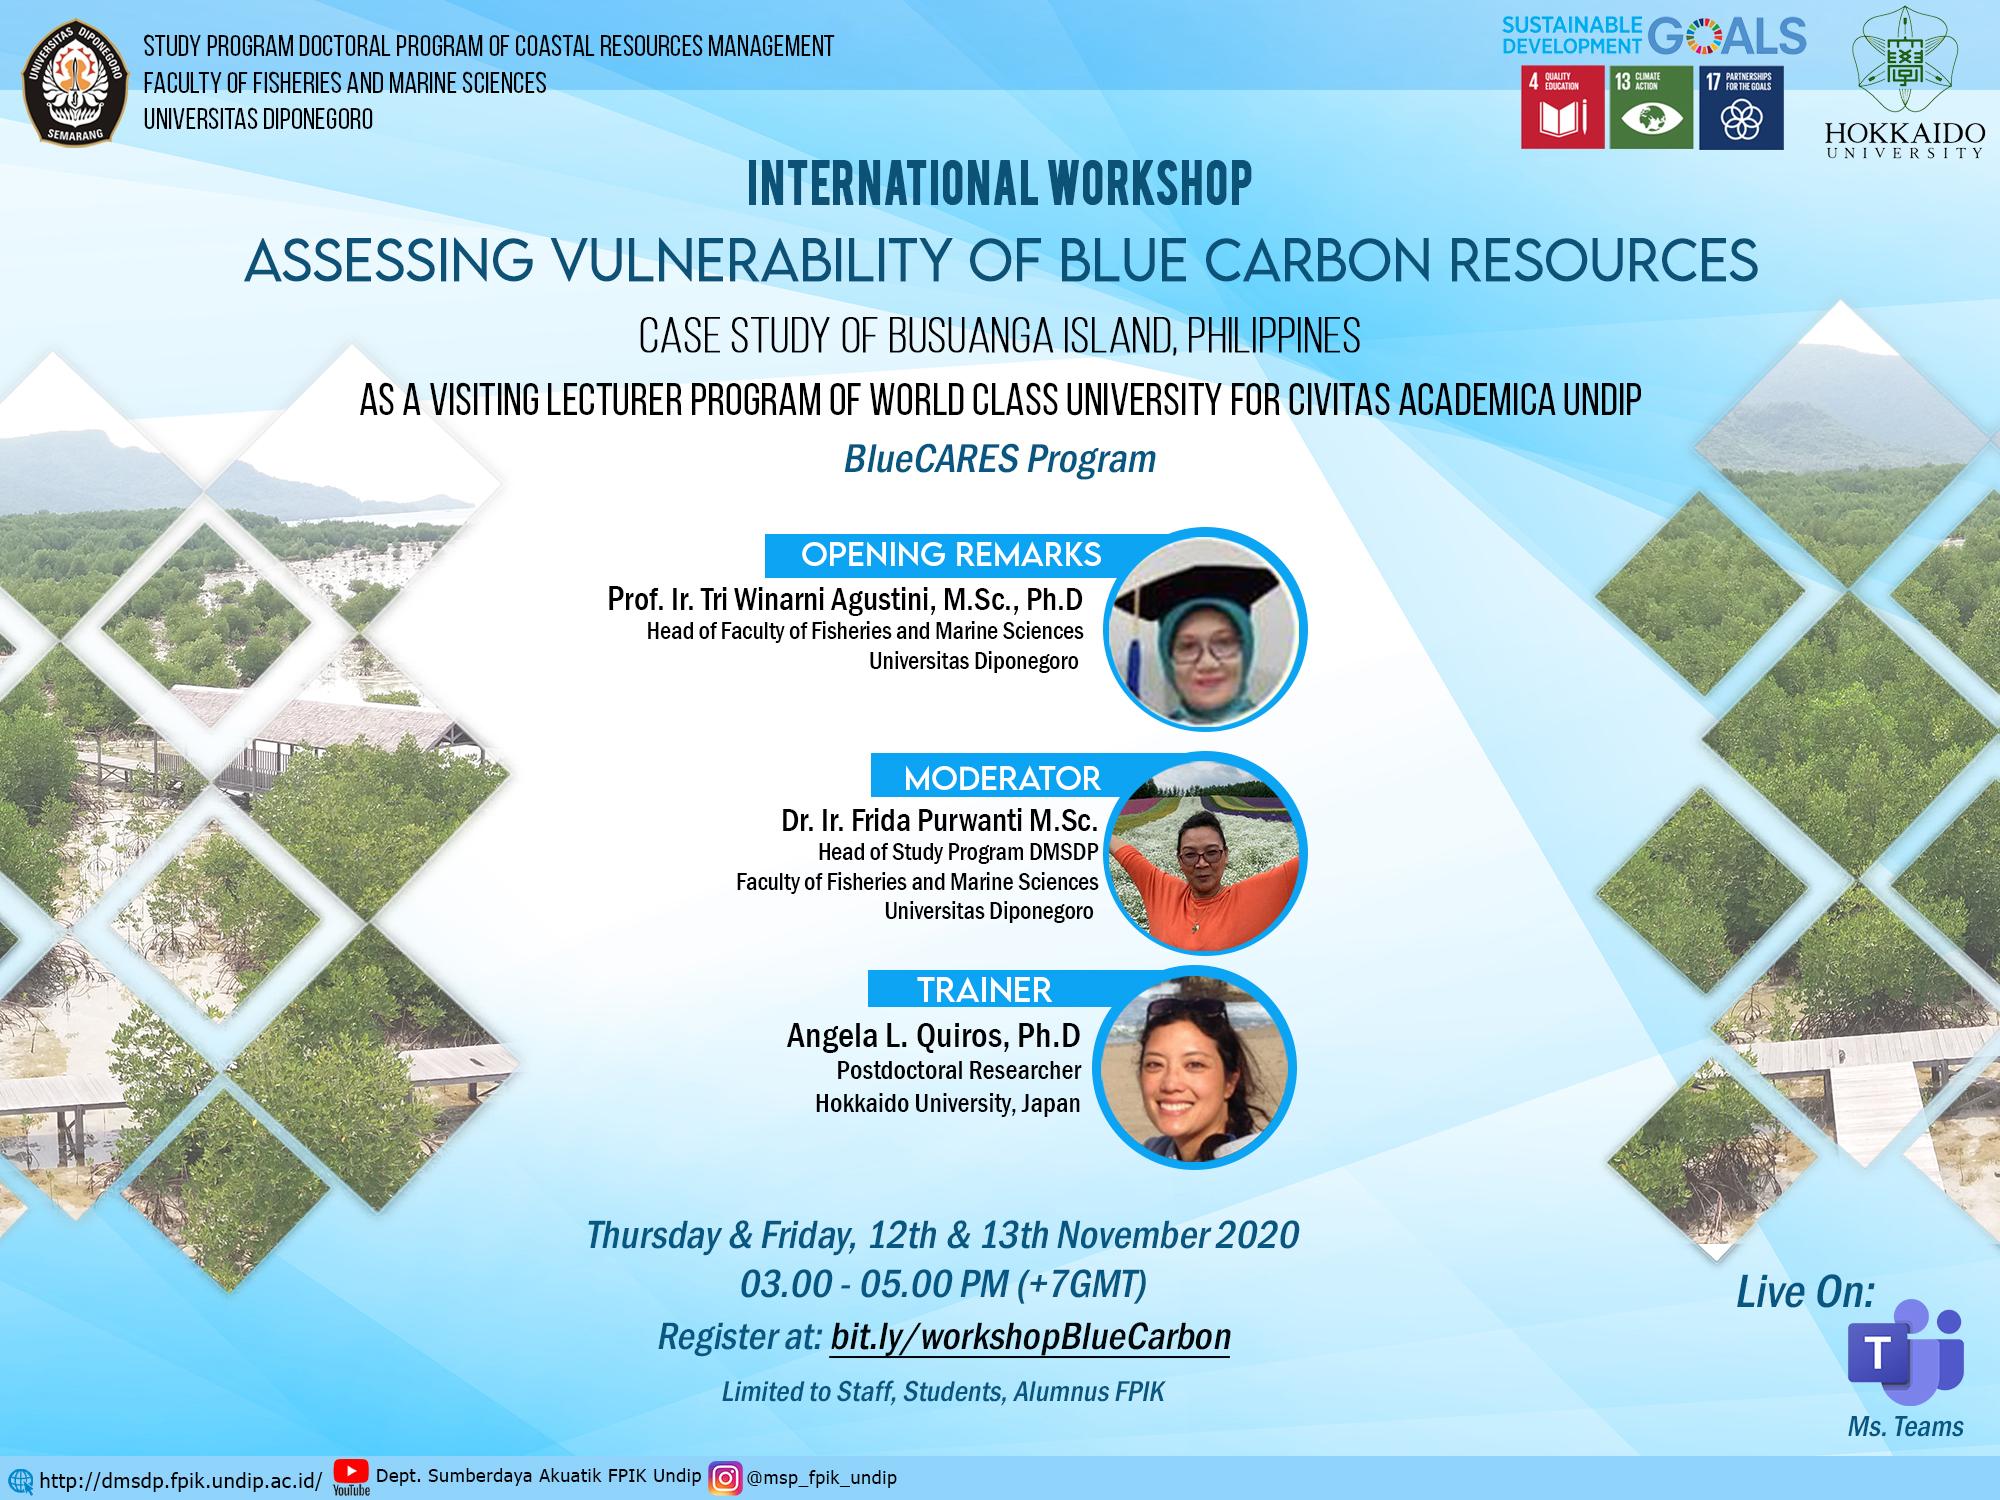 International Conference on Tropical and Coastal Region Eco-Development 2020